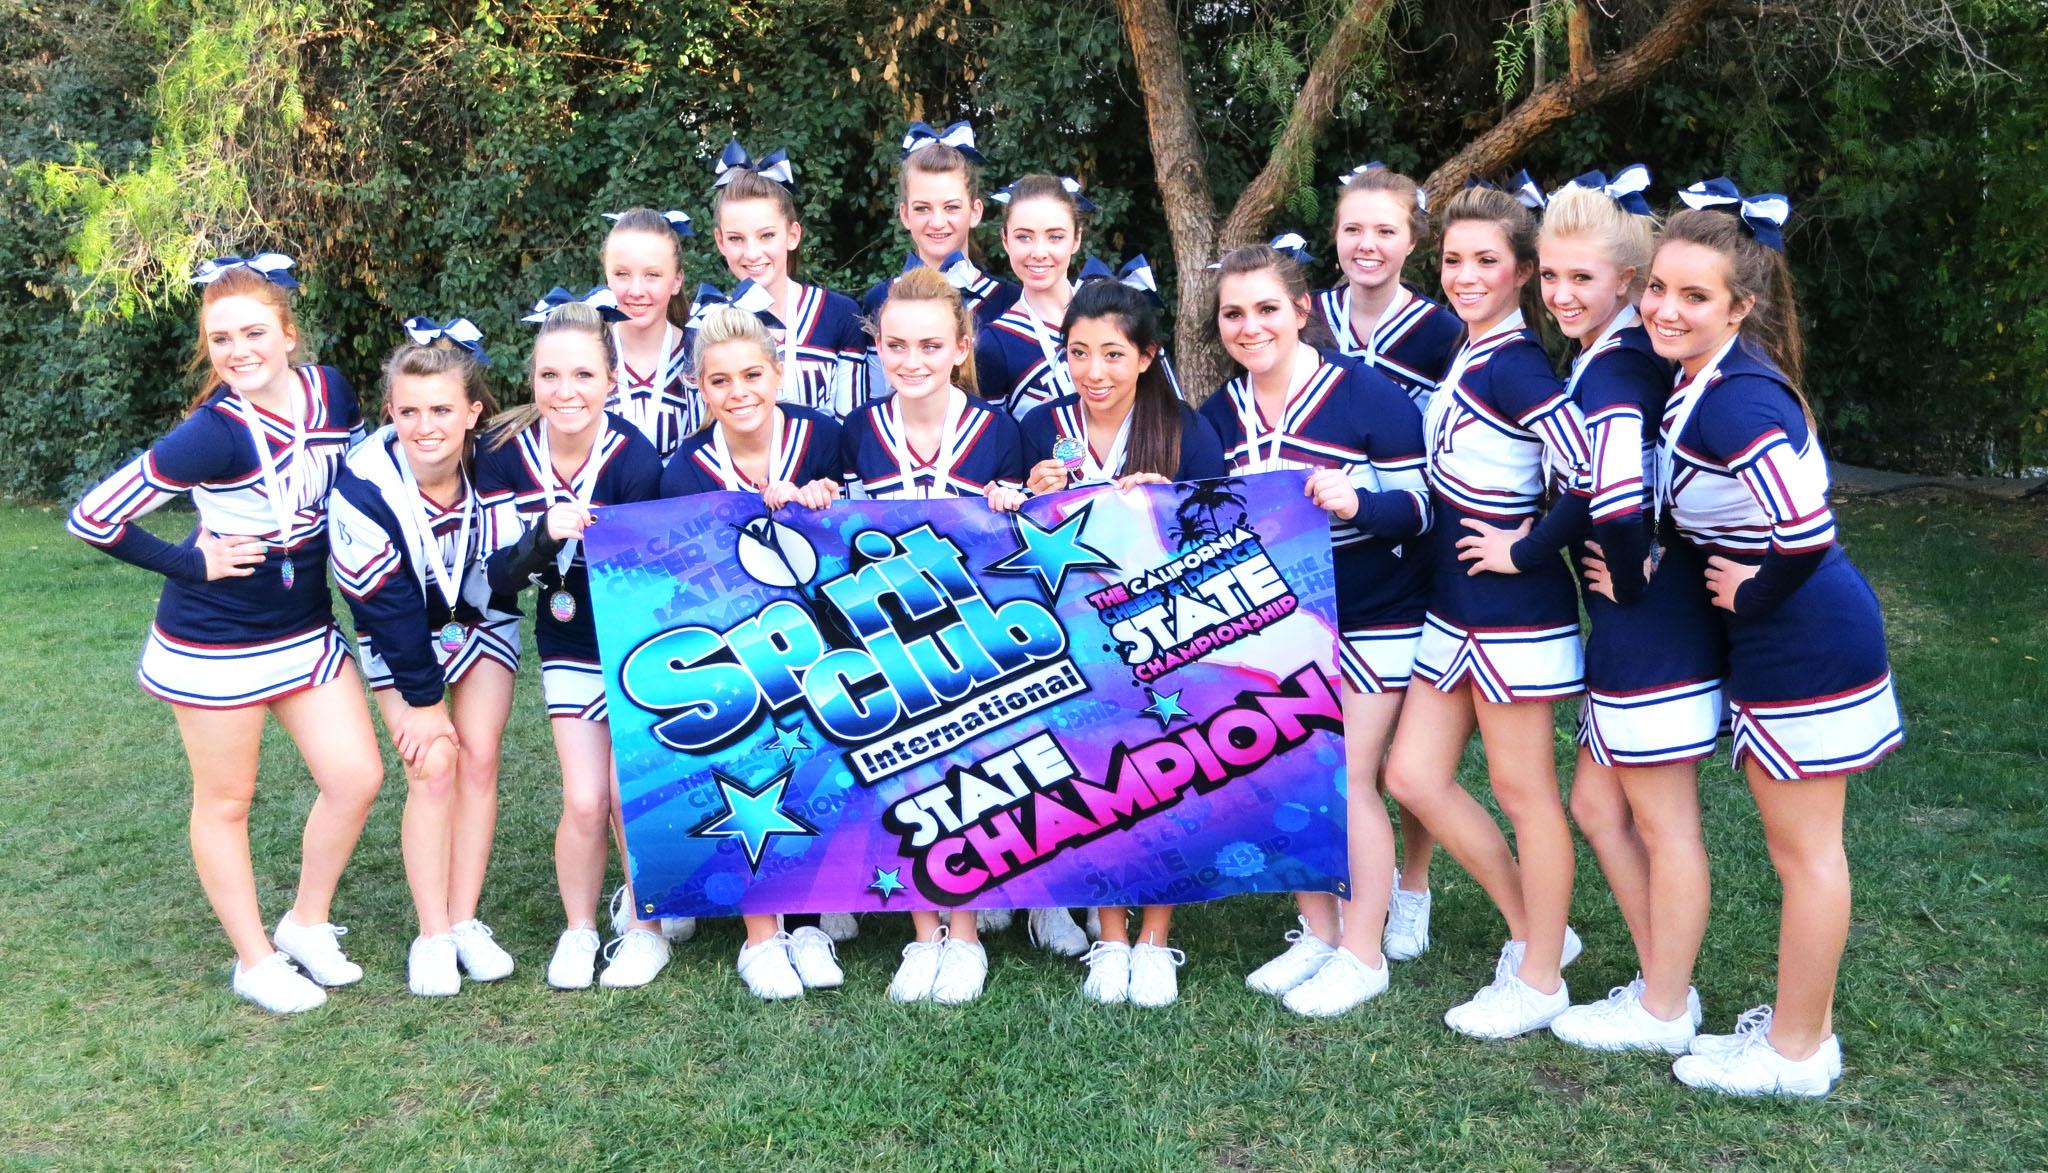 20130309 - TRINITY - Cheer State Champions-5